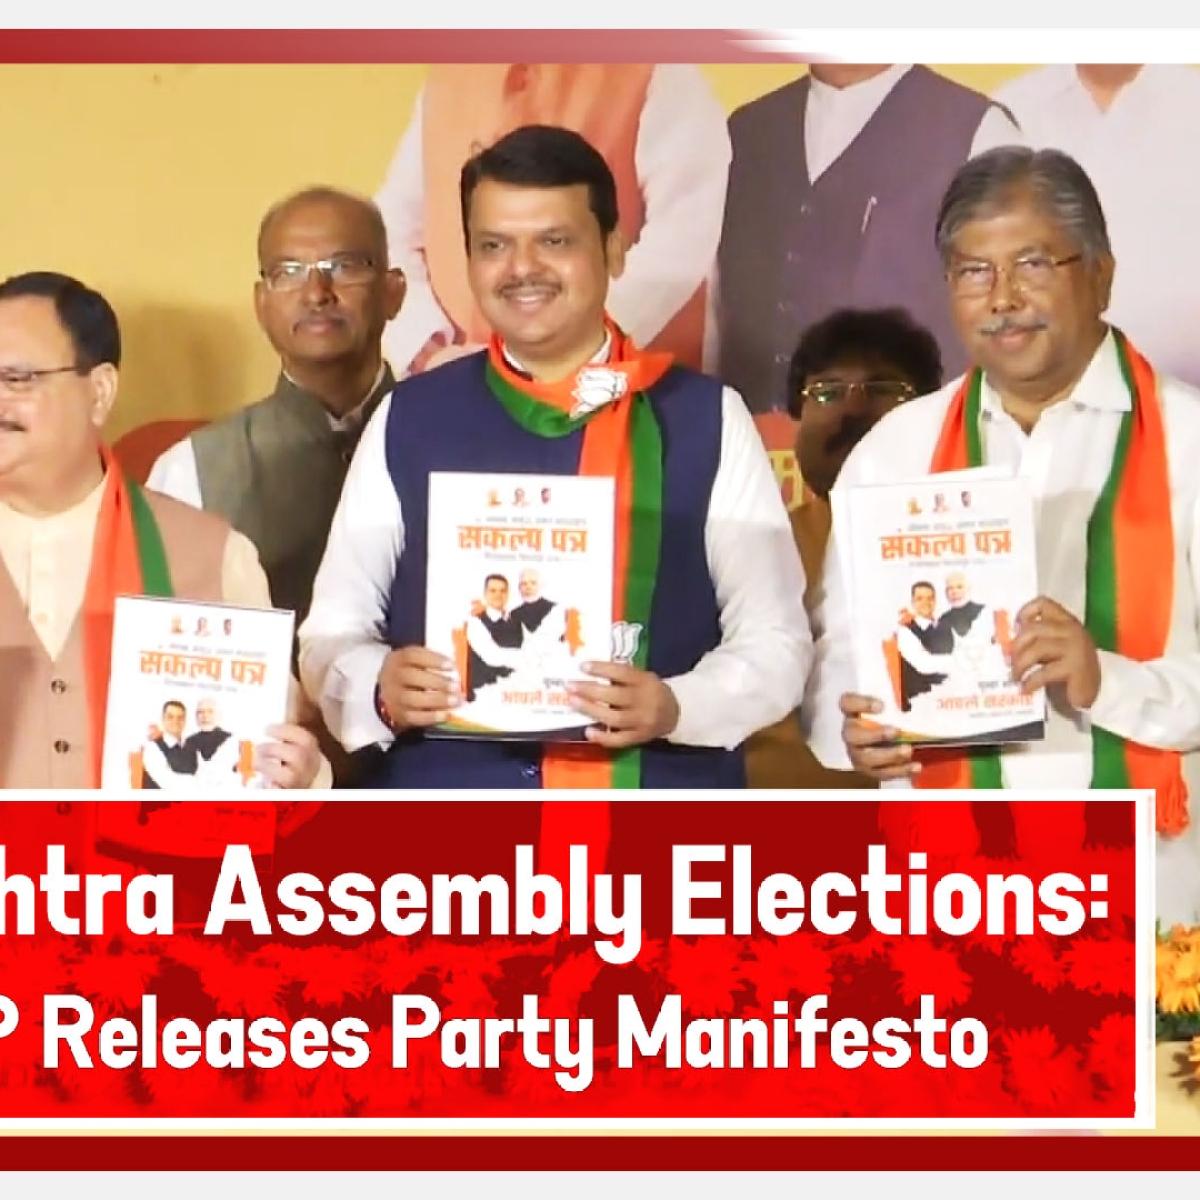 Maharashtra Assembly Elections: CM Fadnavis BJP Releases Party Manifesto